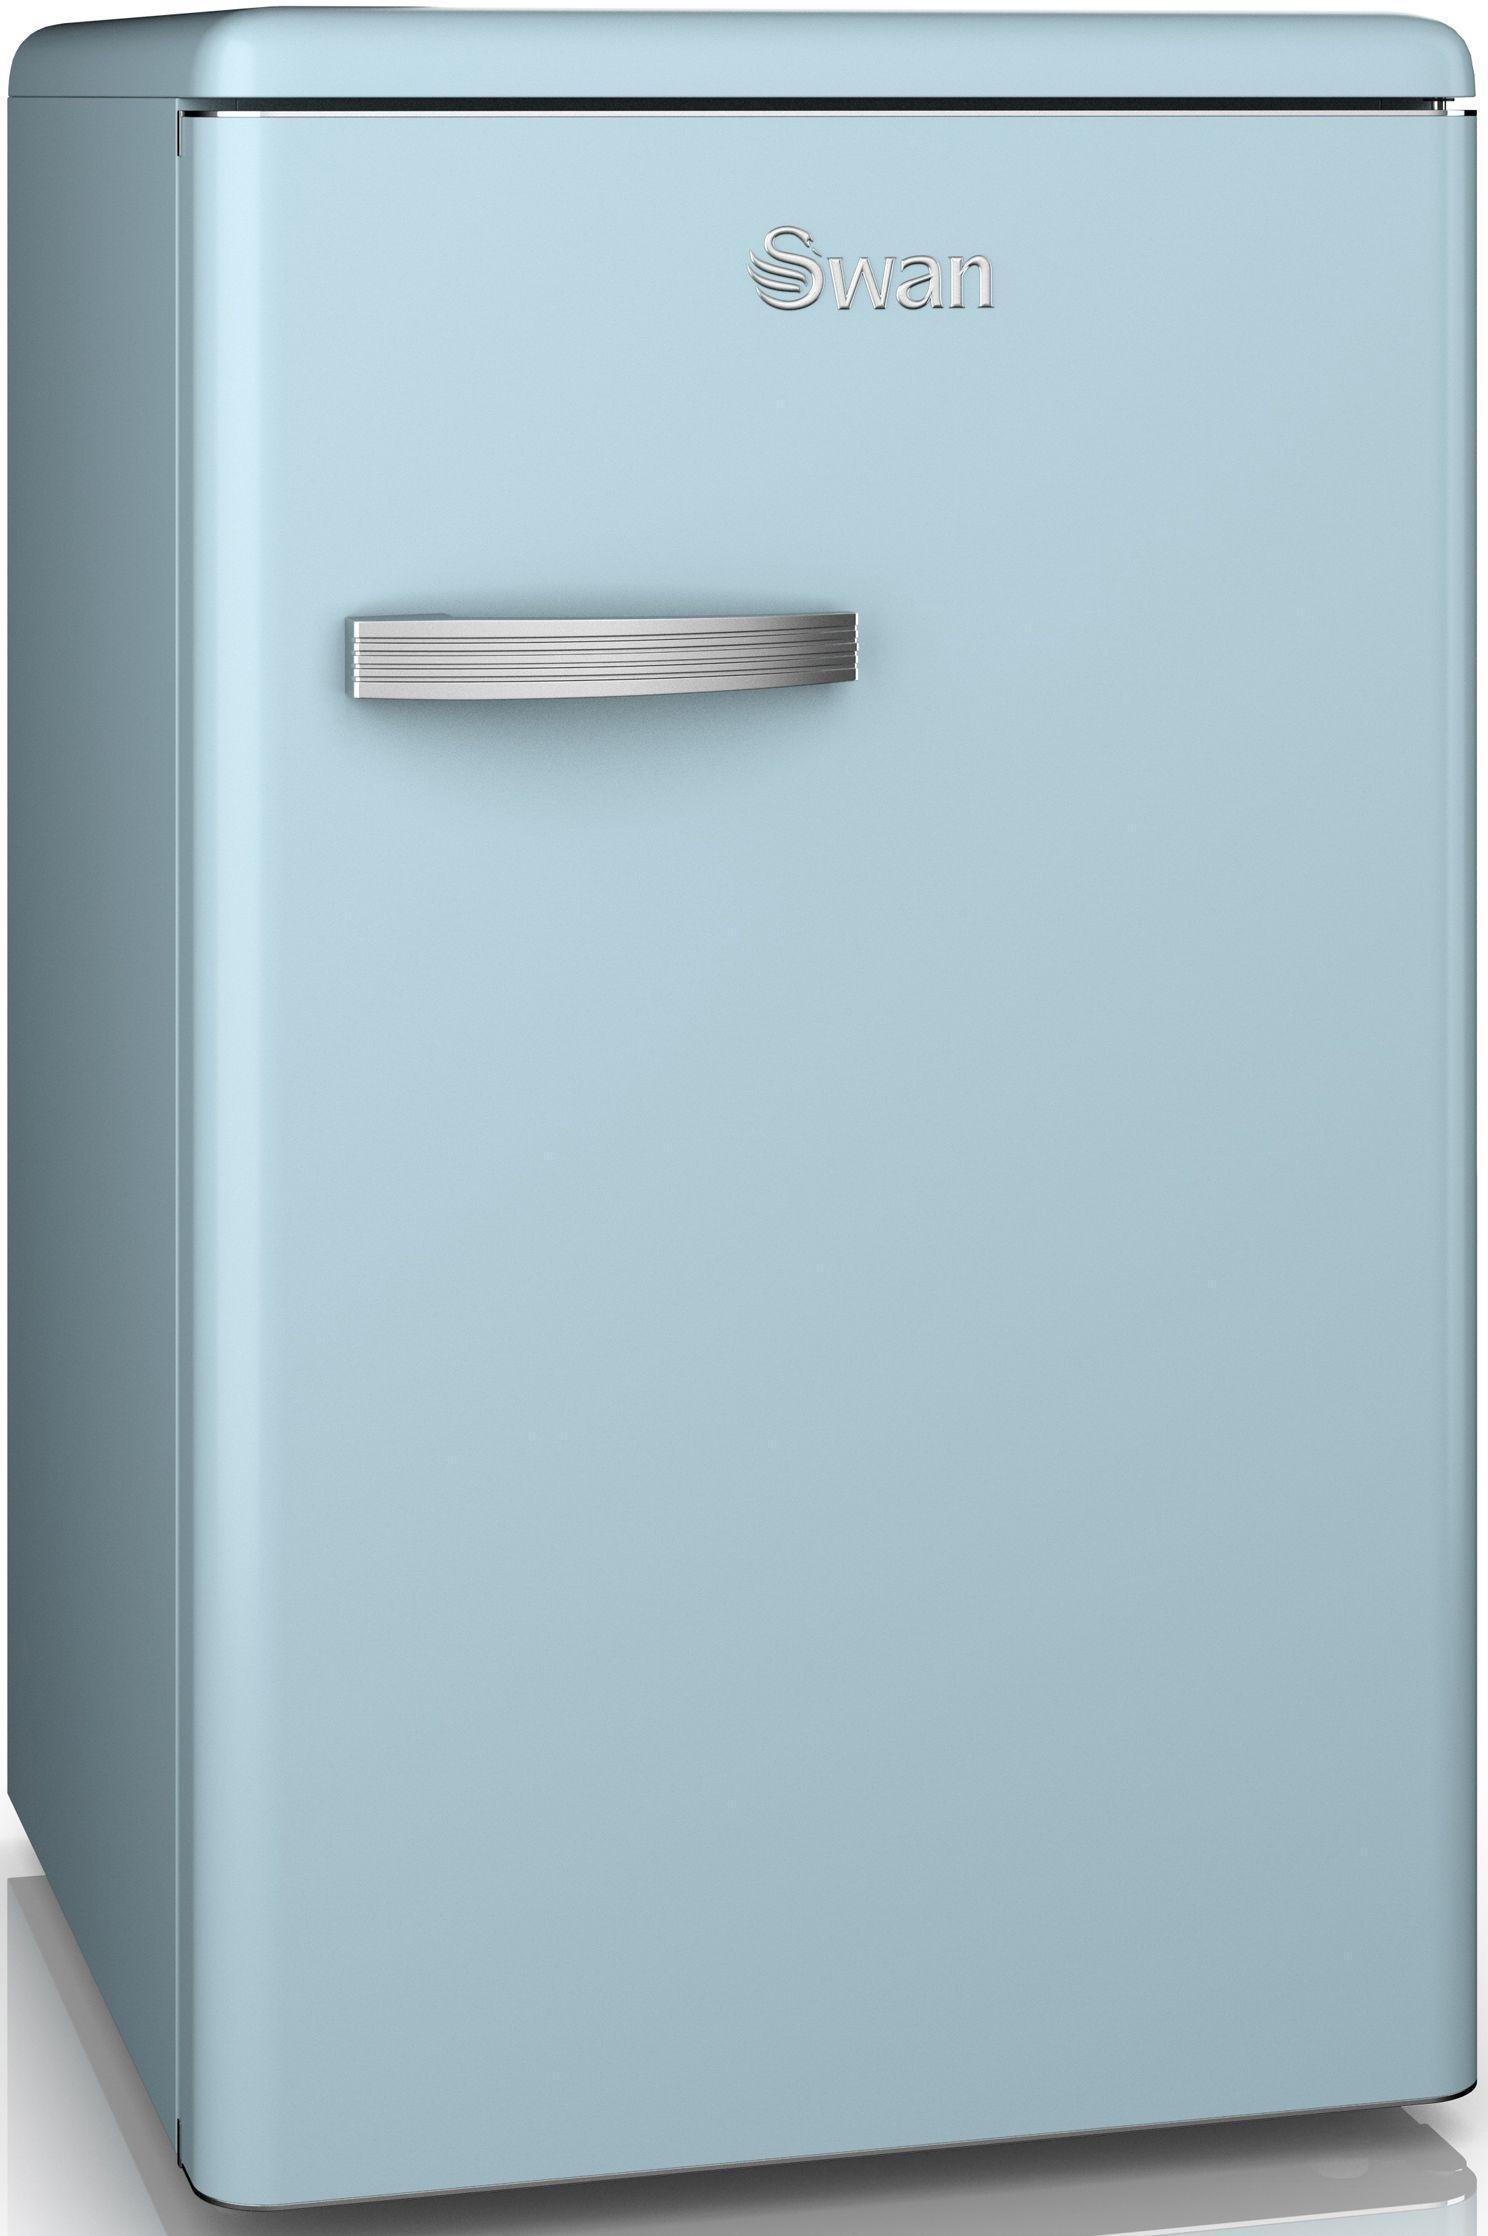 swan-sr1103bln-retro-larder-fridge-blue